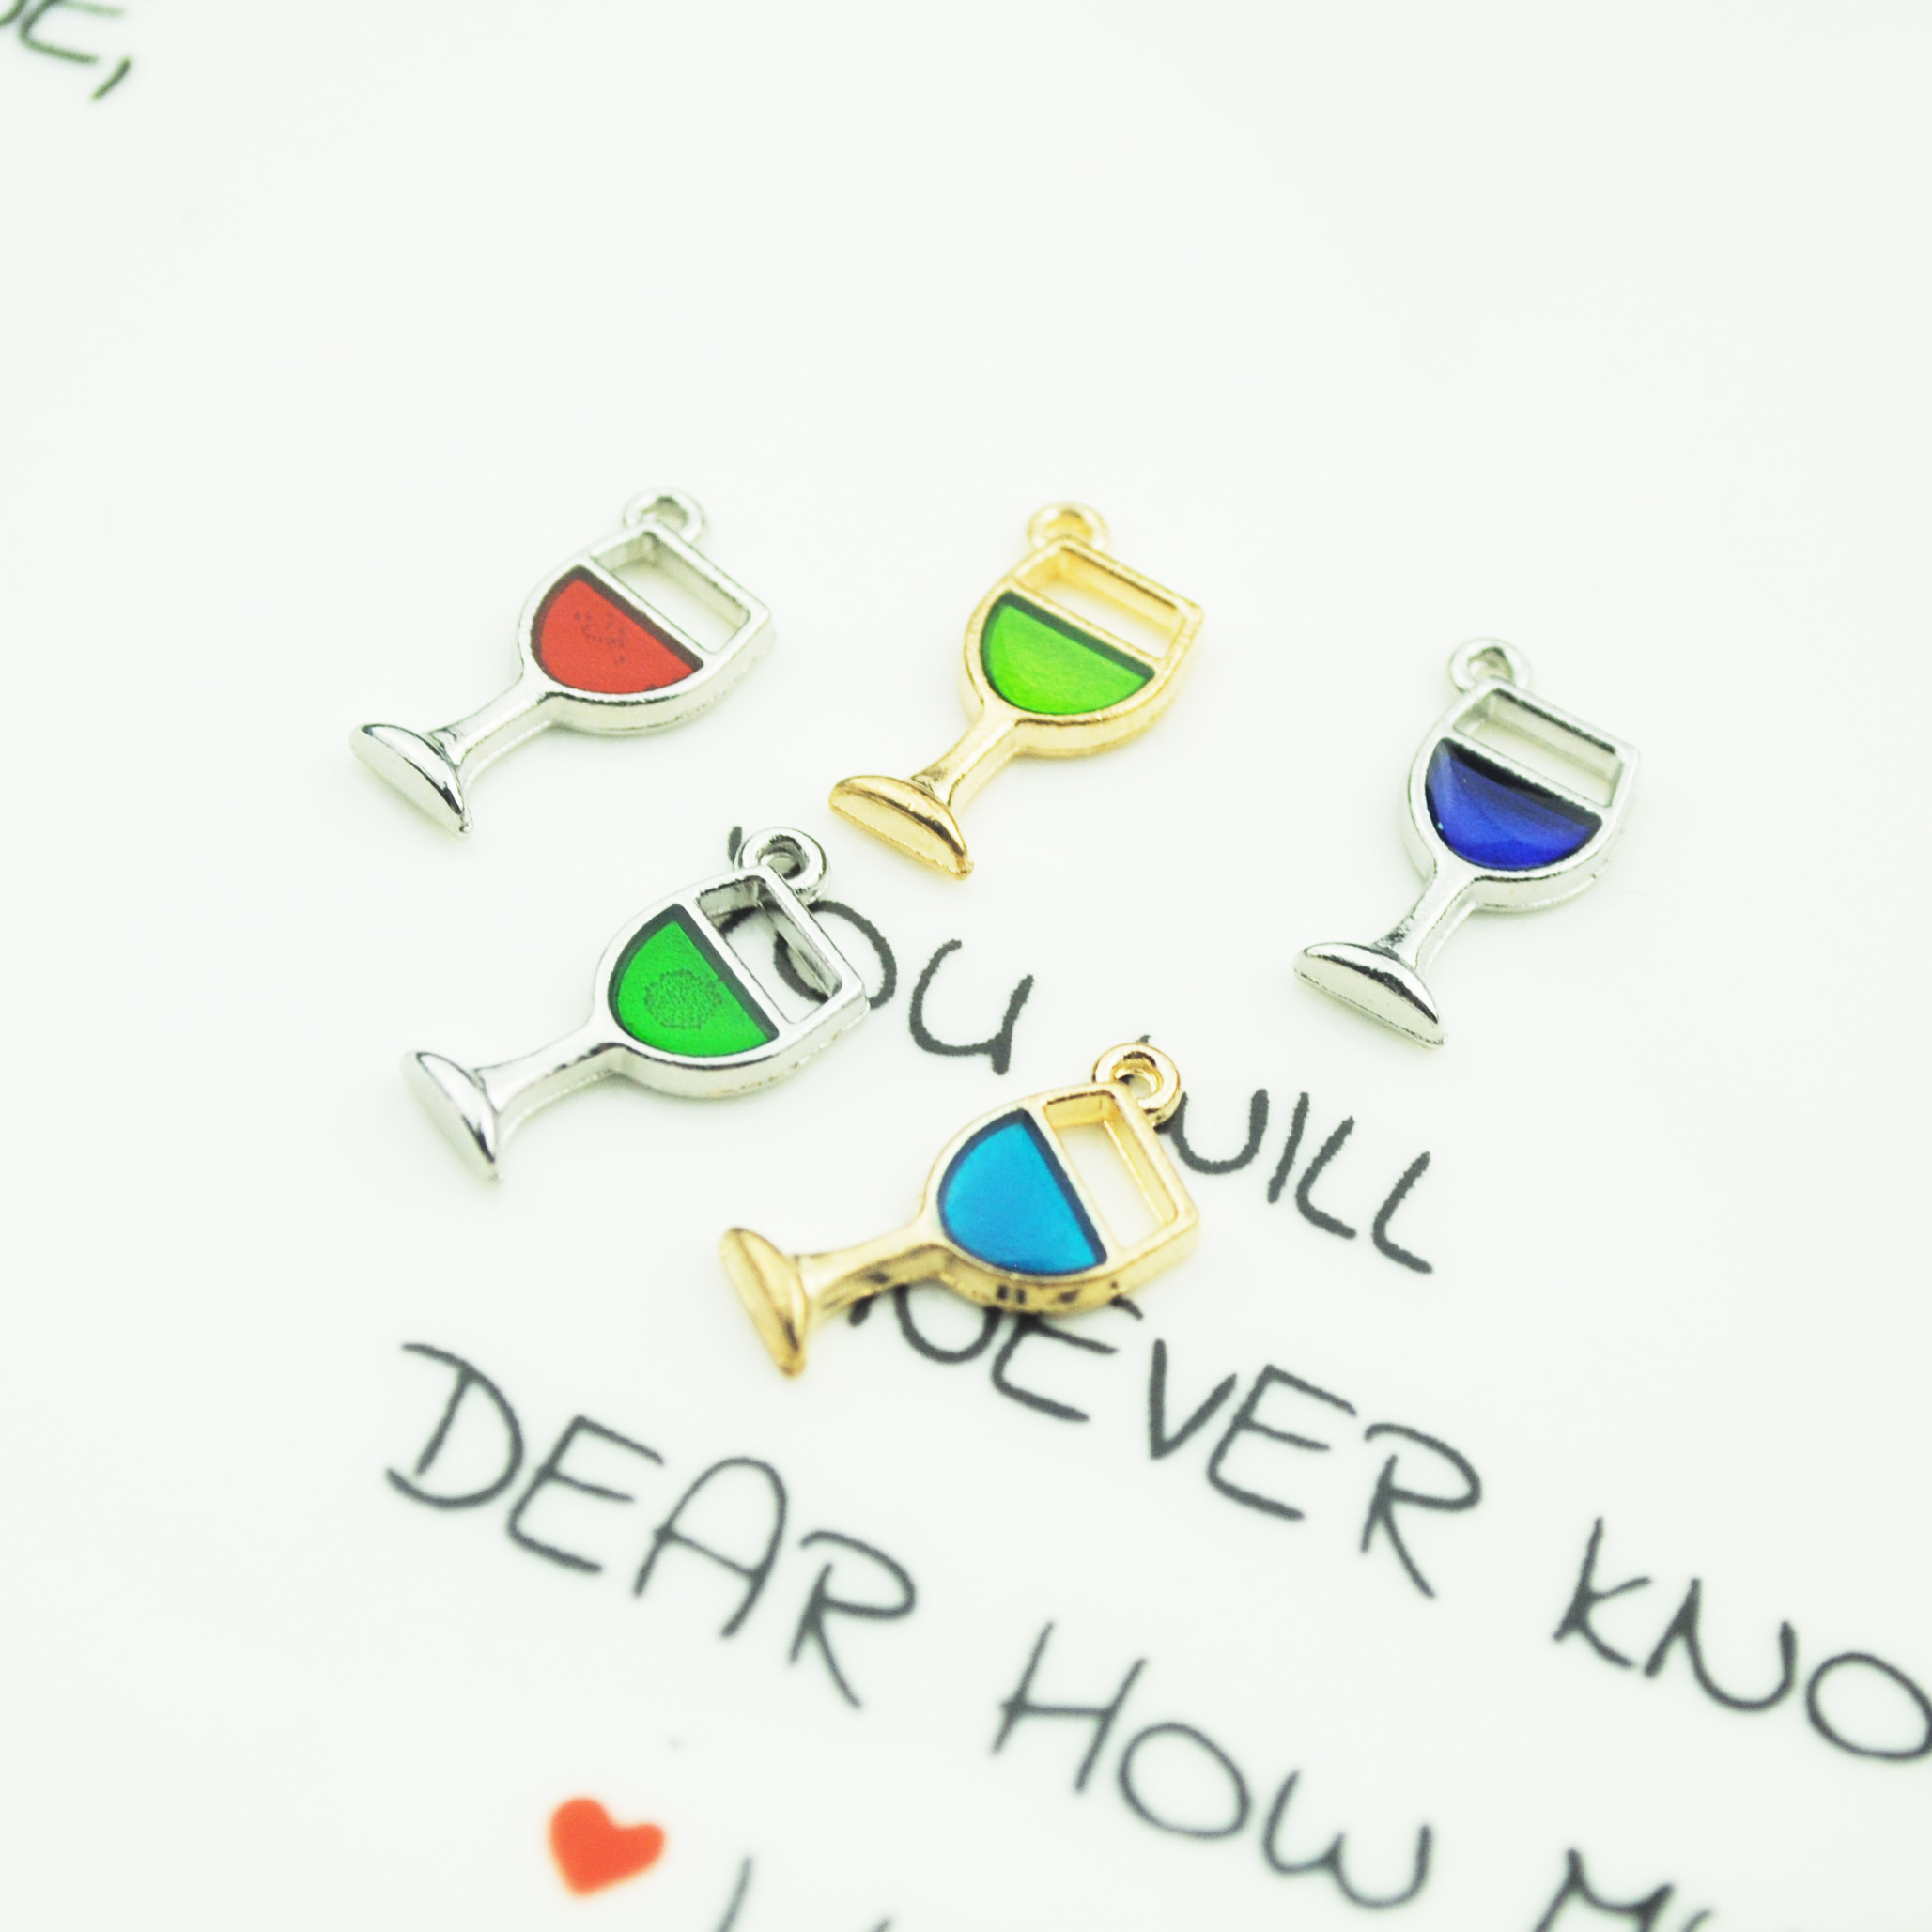 10pcs lot 9 18mm Colorful Enamel Wine In Glass Enamel Charm Zinc Alloy Little Pendant Charm DIY Cute Earring Jewelry in Charms from Jewelry Accessories